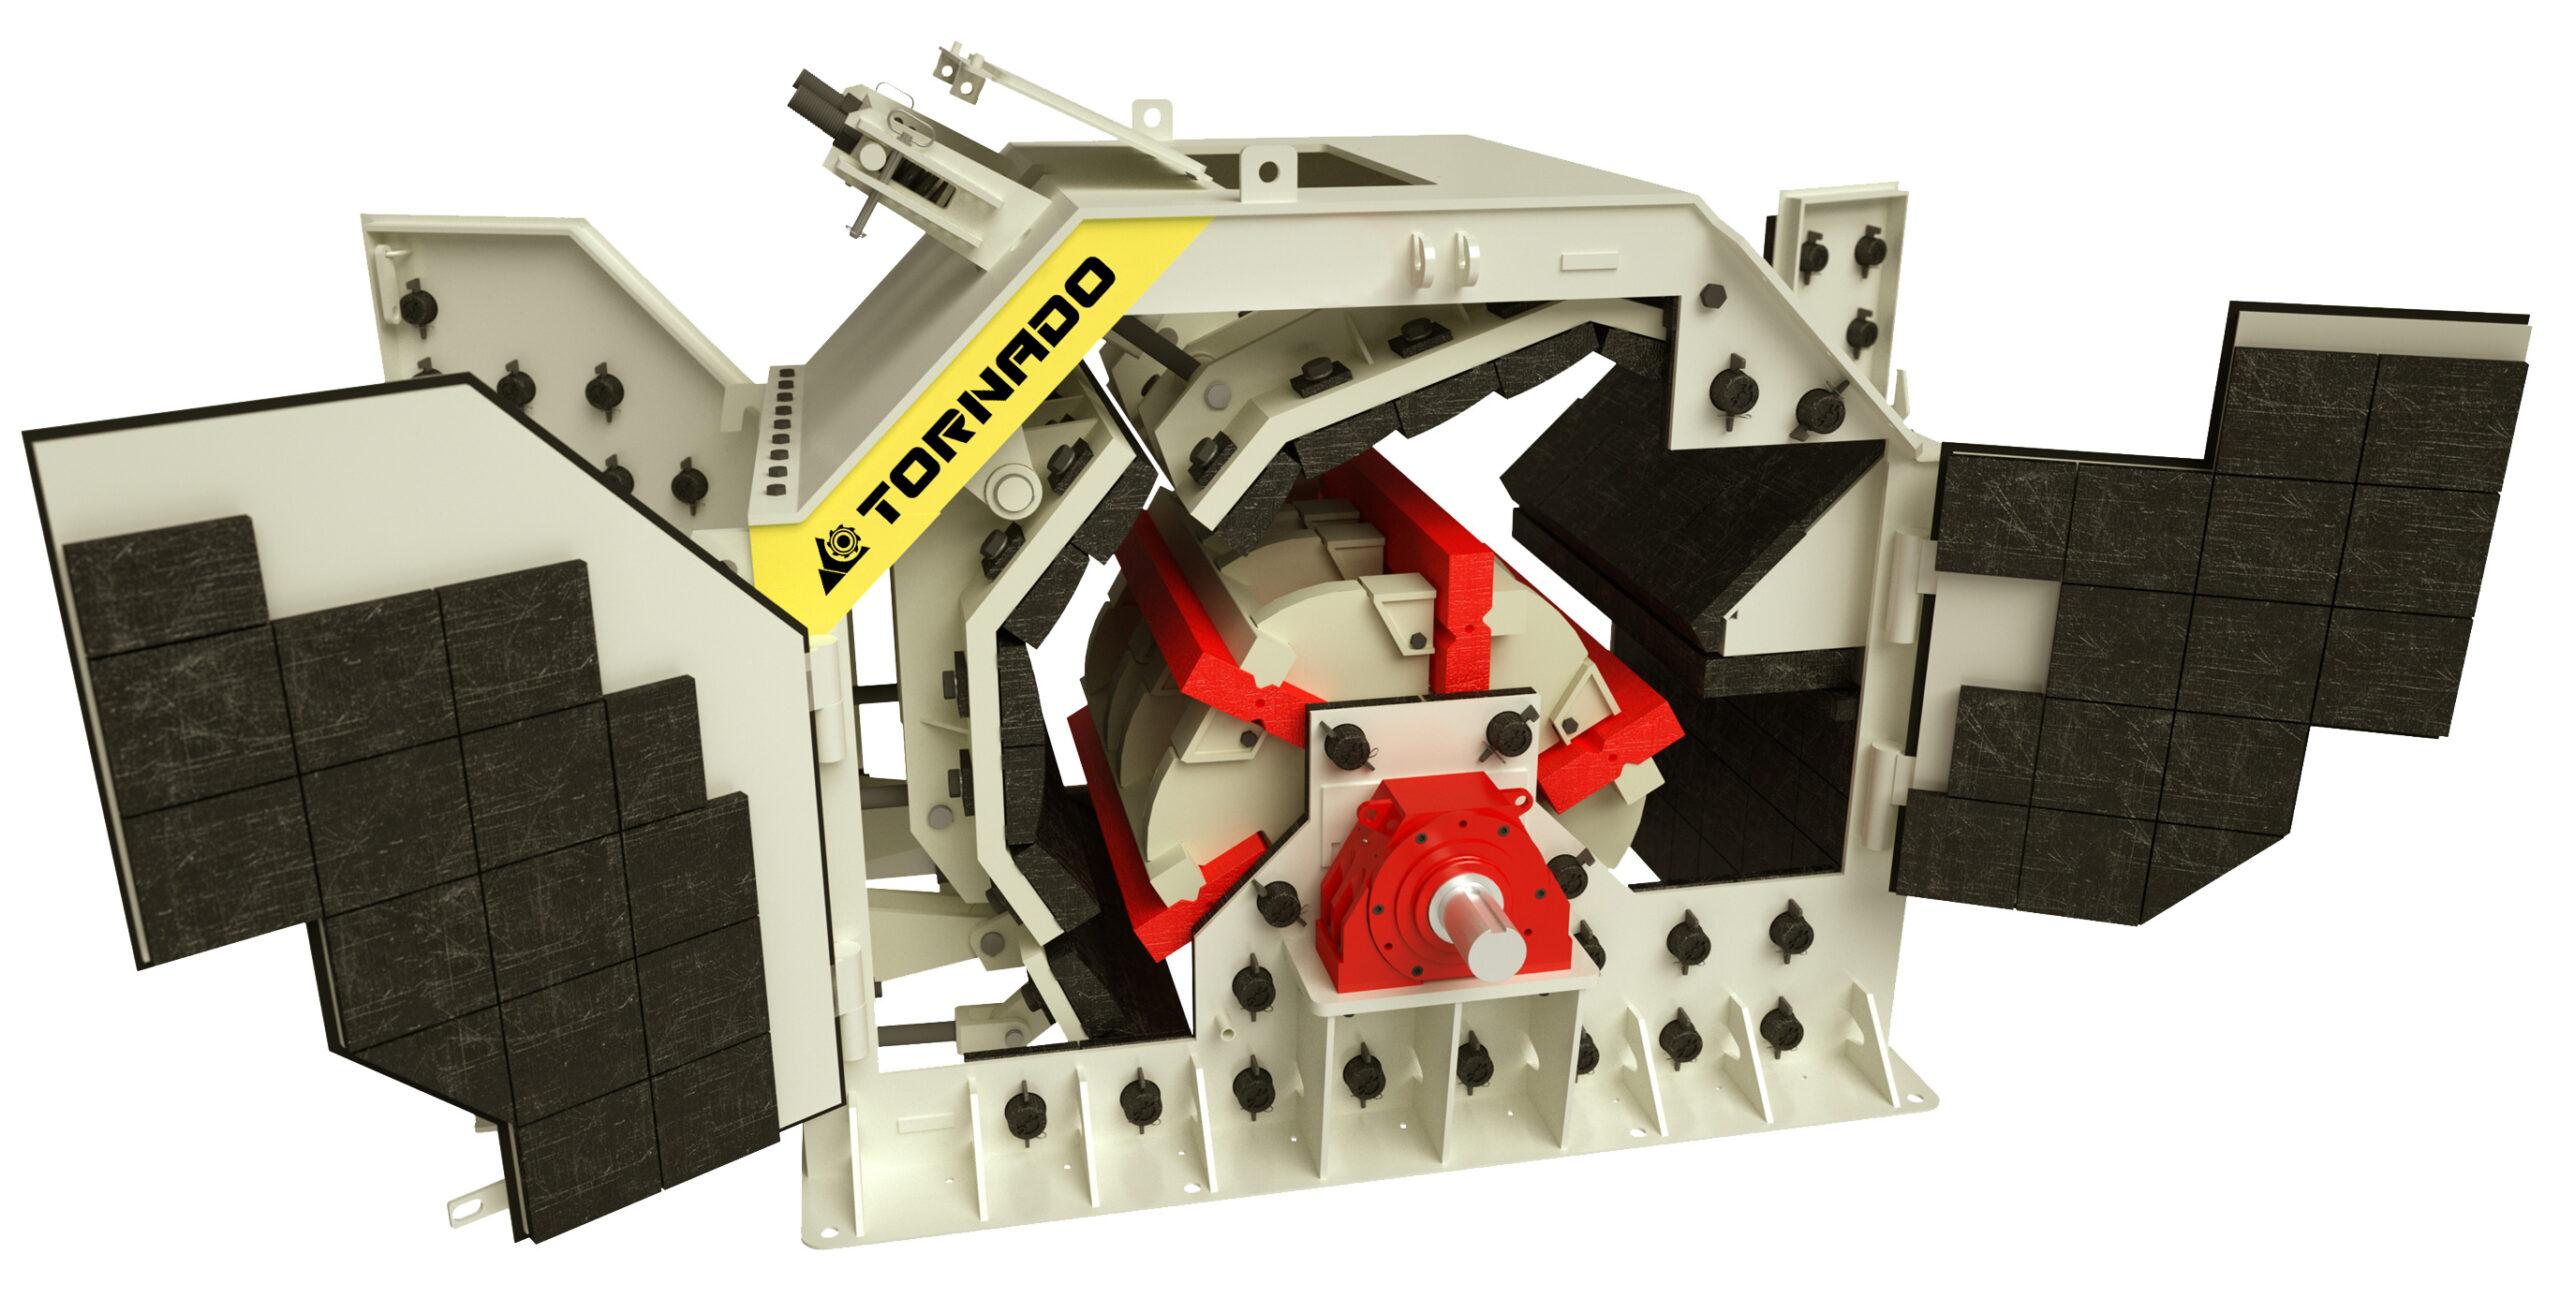 Роторная дробилка Tornado 300 от производителя (Торнадо 300, Тауро 50, Tauro 50)